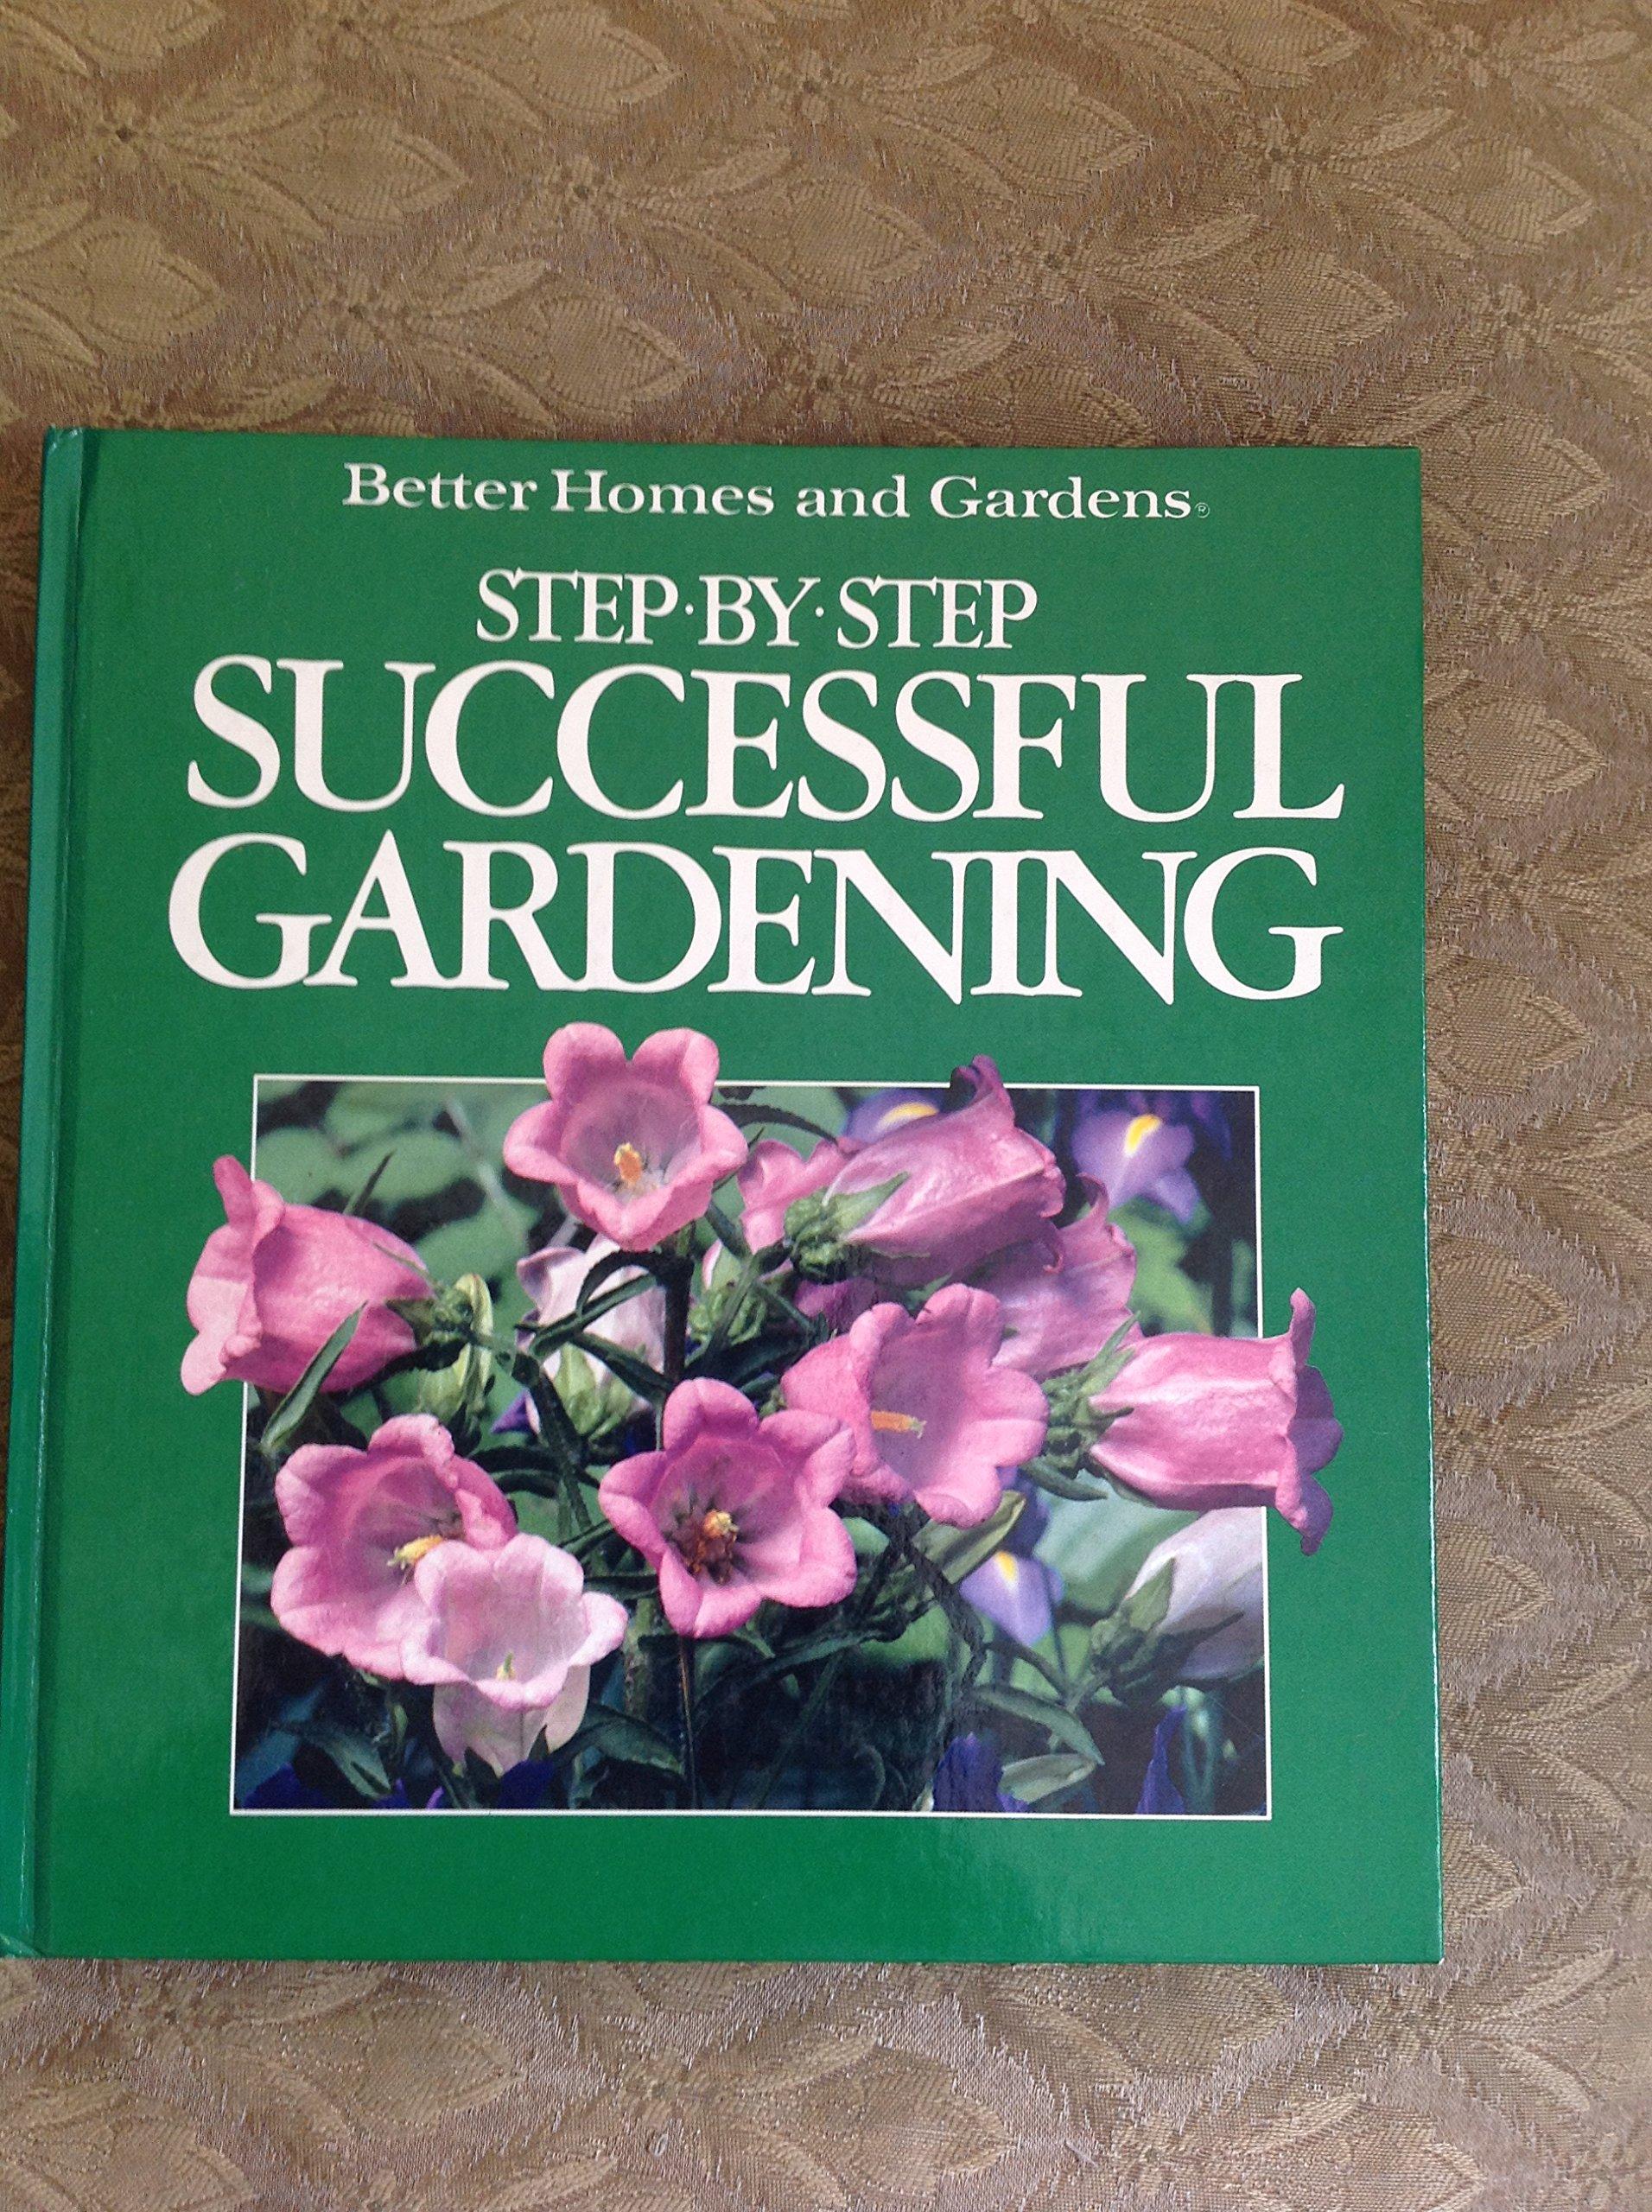 Shade Gardens; Step-by-Step Successful Gardening